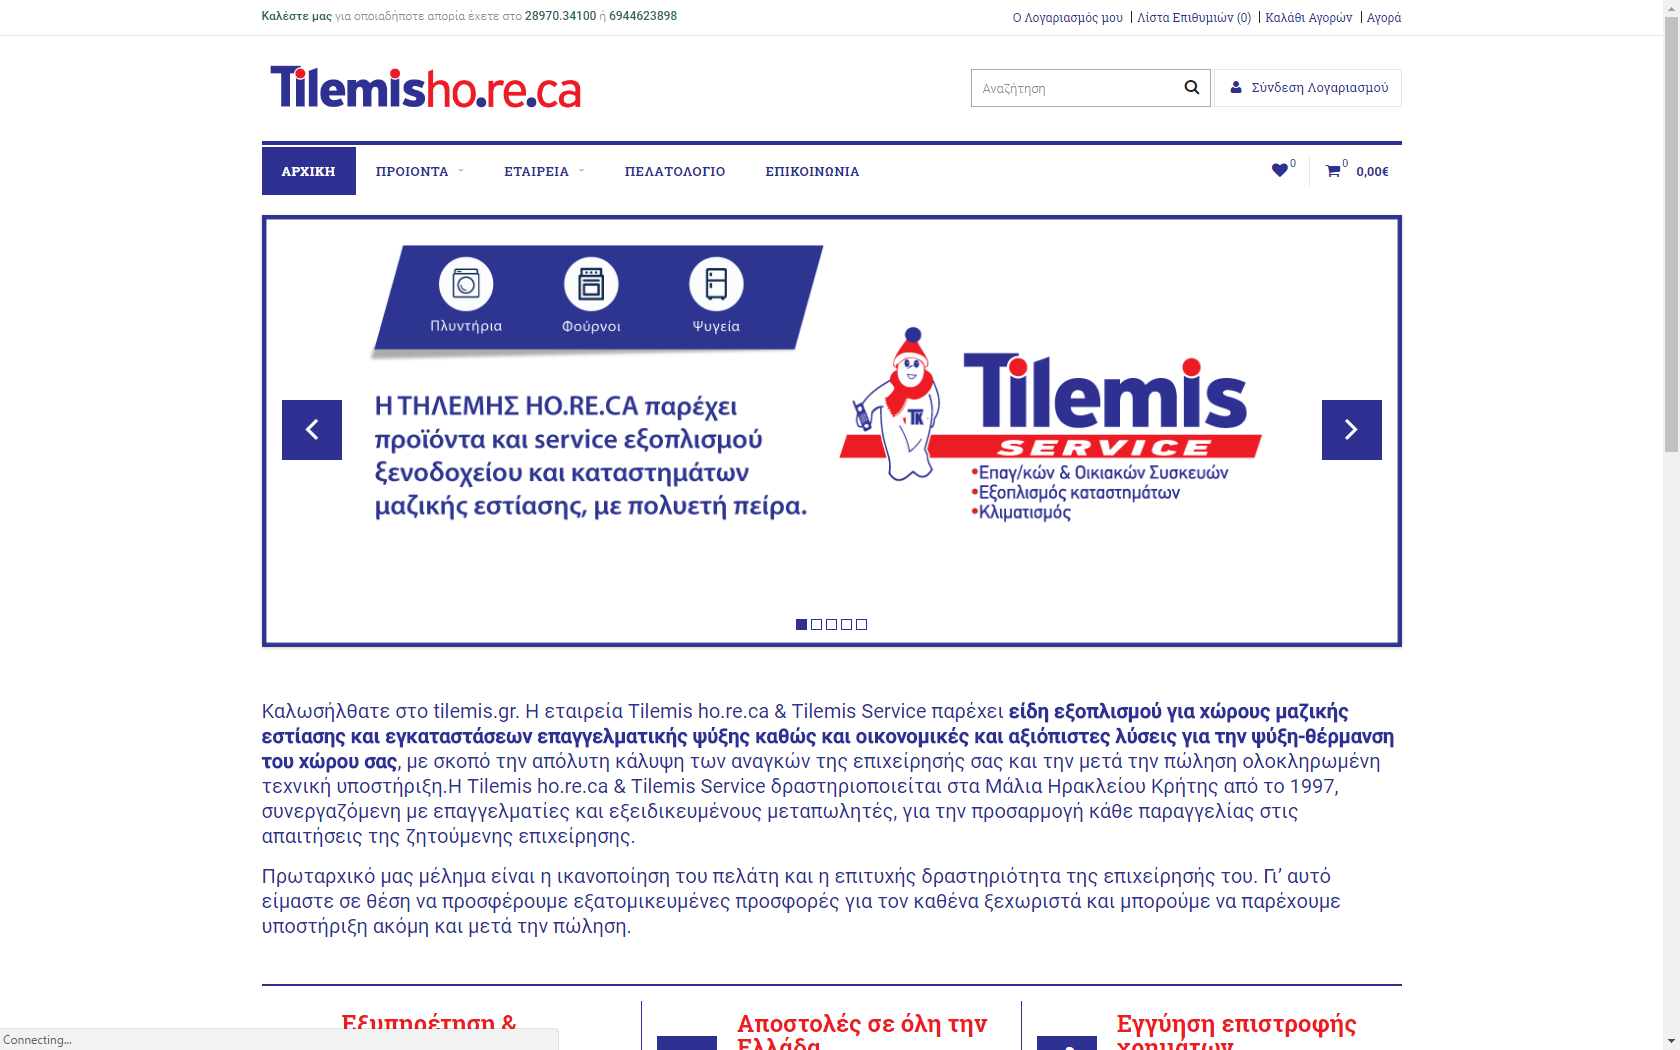 http://www.jupiweb.com/assets/uploads/files/thumbs/thumb_79c09-tilemis.png